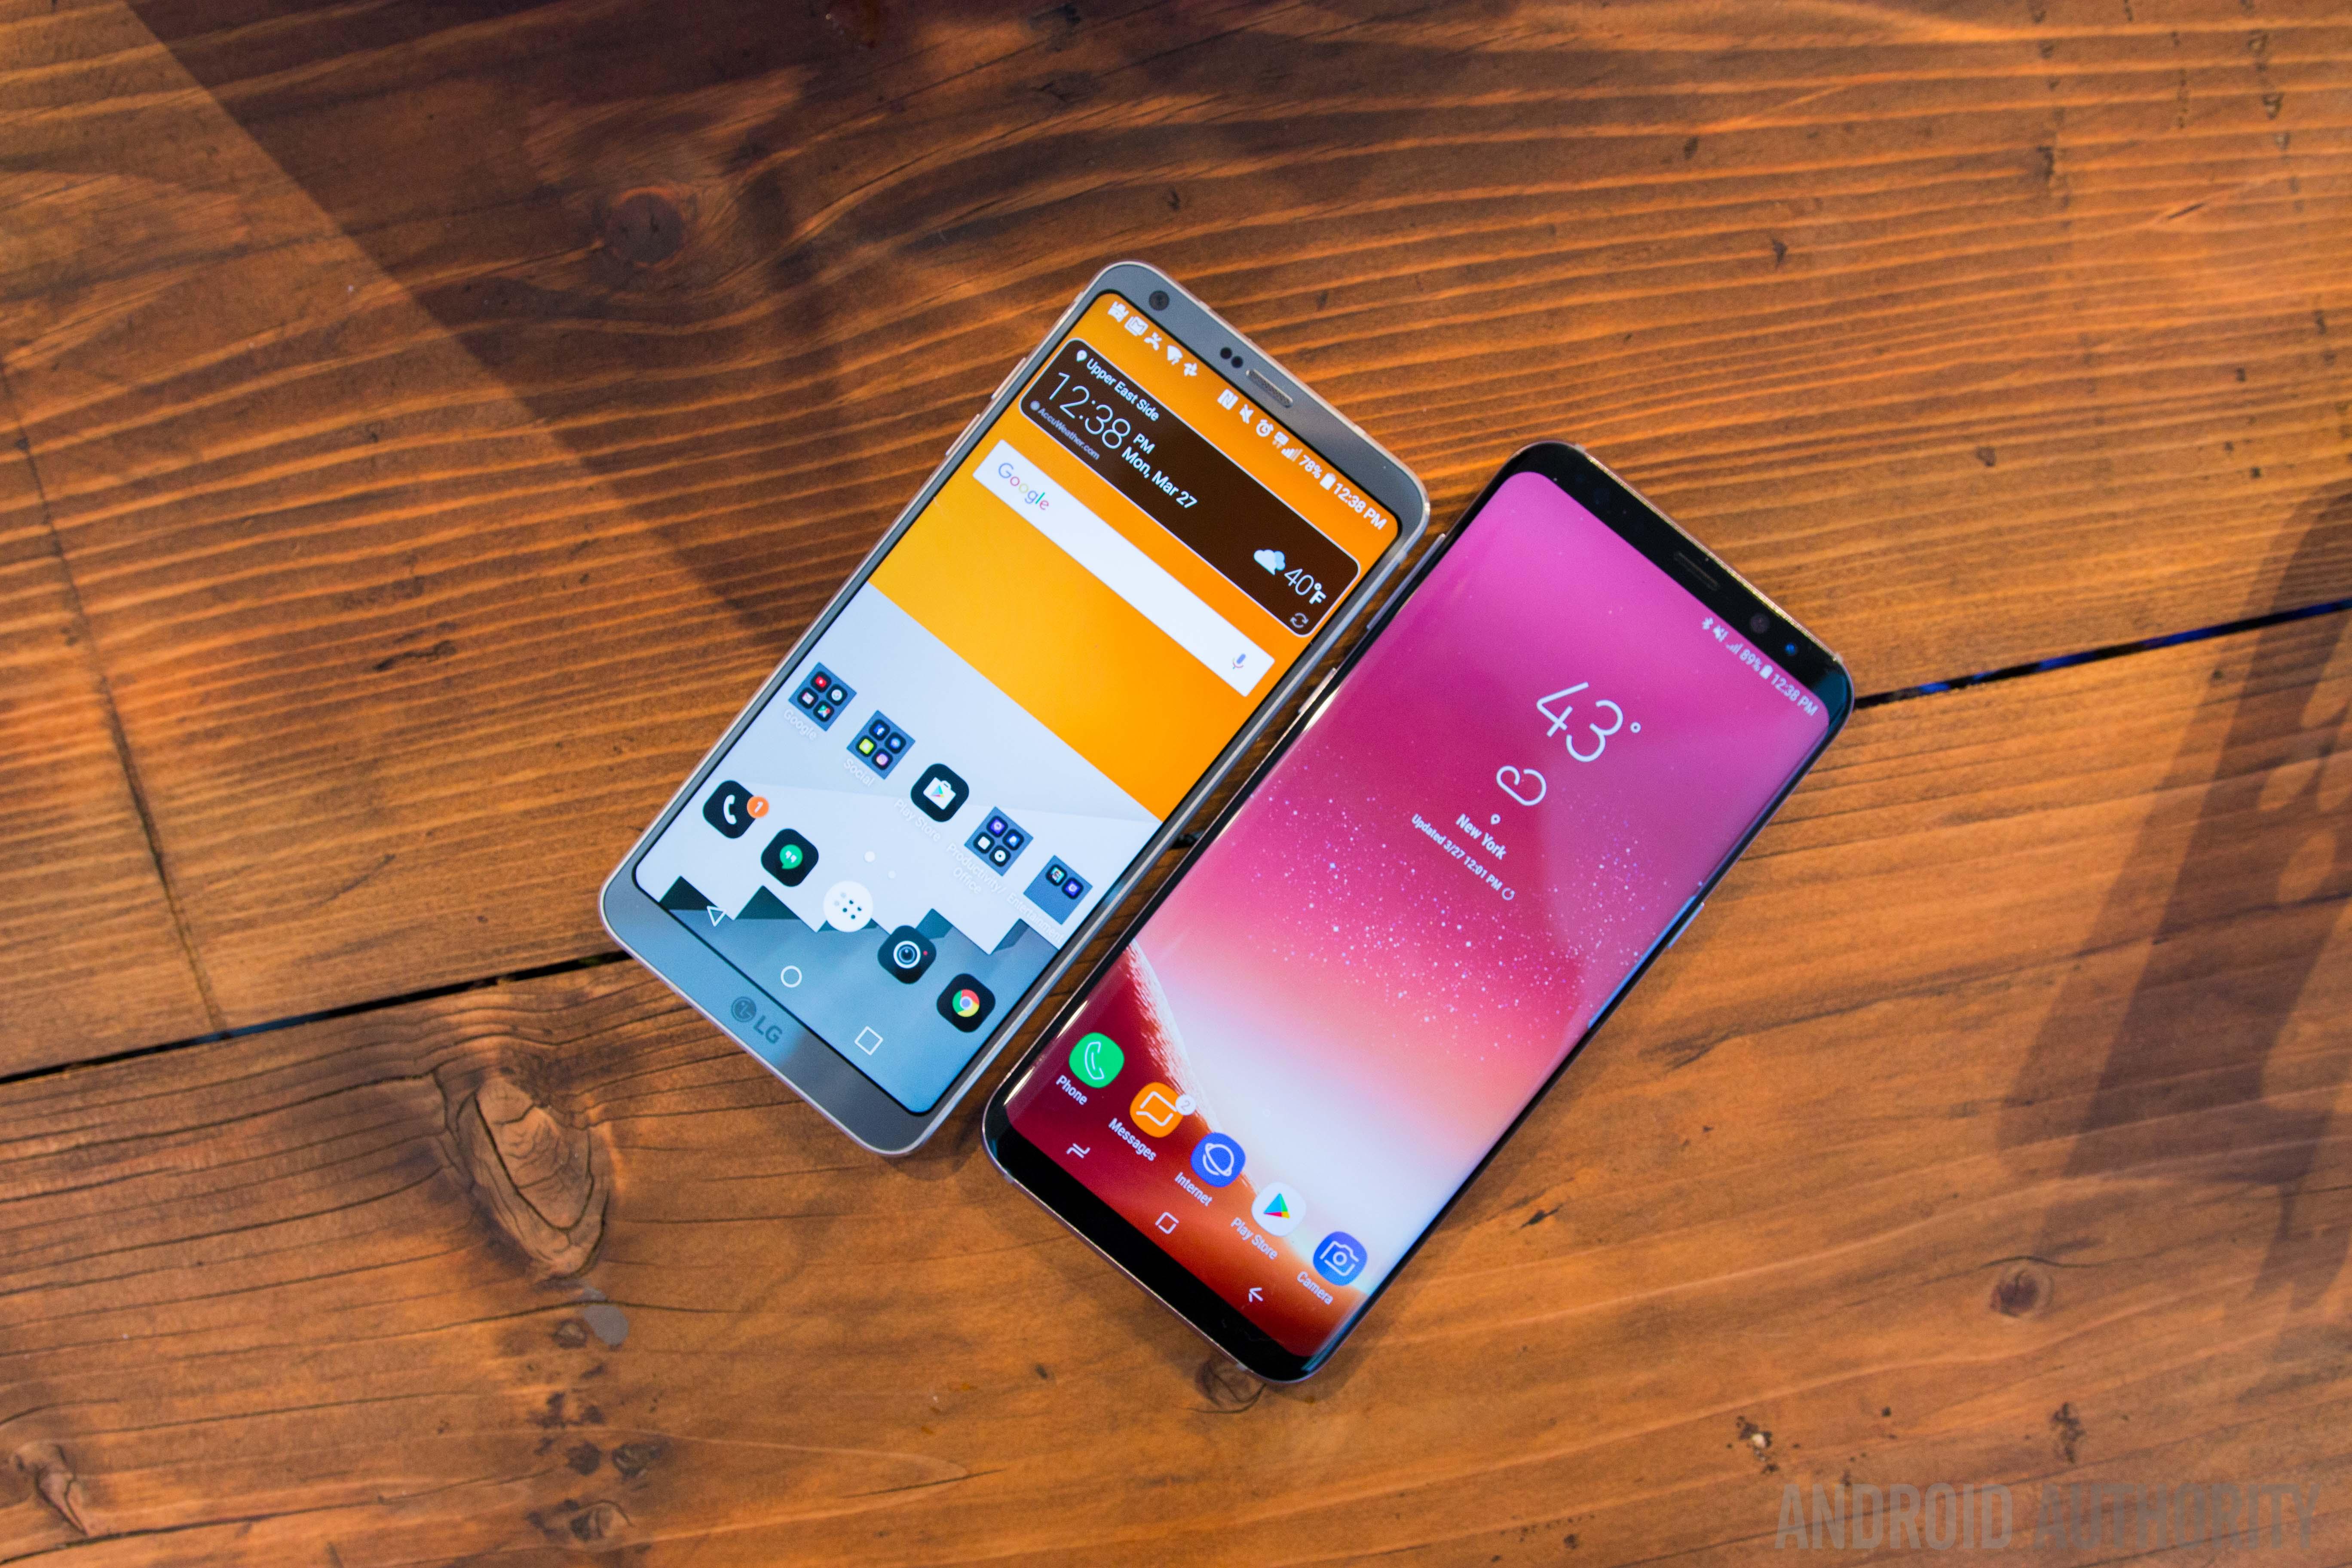 Samsung Galaxy S8 vs LG G6 comparison